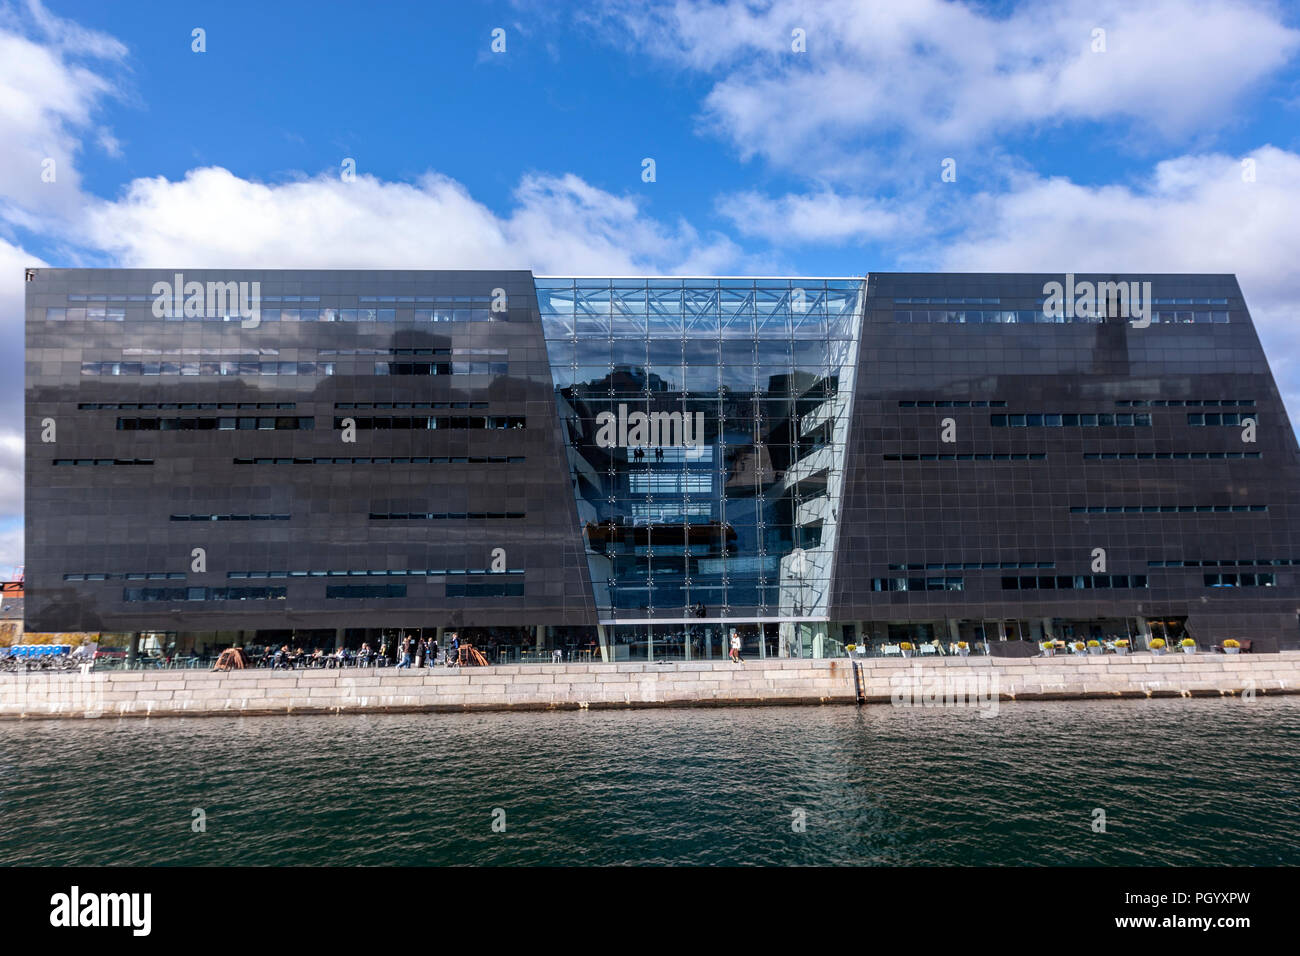 Reflection in the facade of the Royal Danish Library, The Black Diamond library, Designed by architects Schmidt Hammer Lassen, Copenhagen, Denmark. Stock Photo